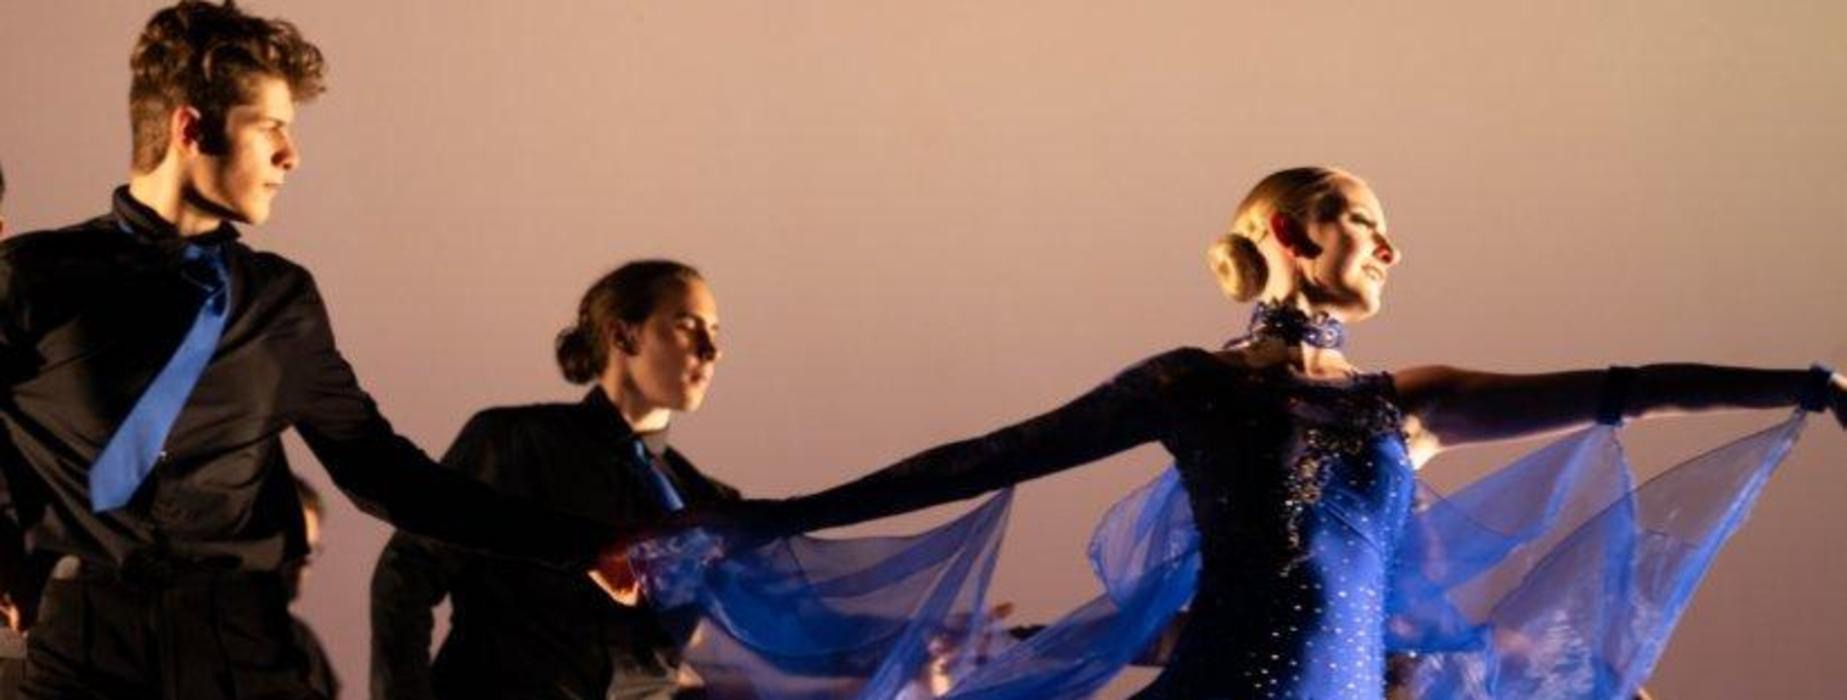 Ballroom Performance